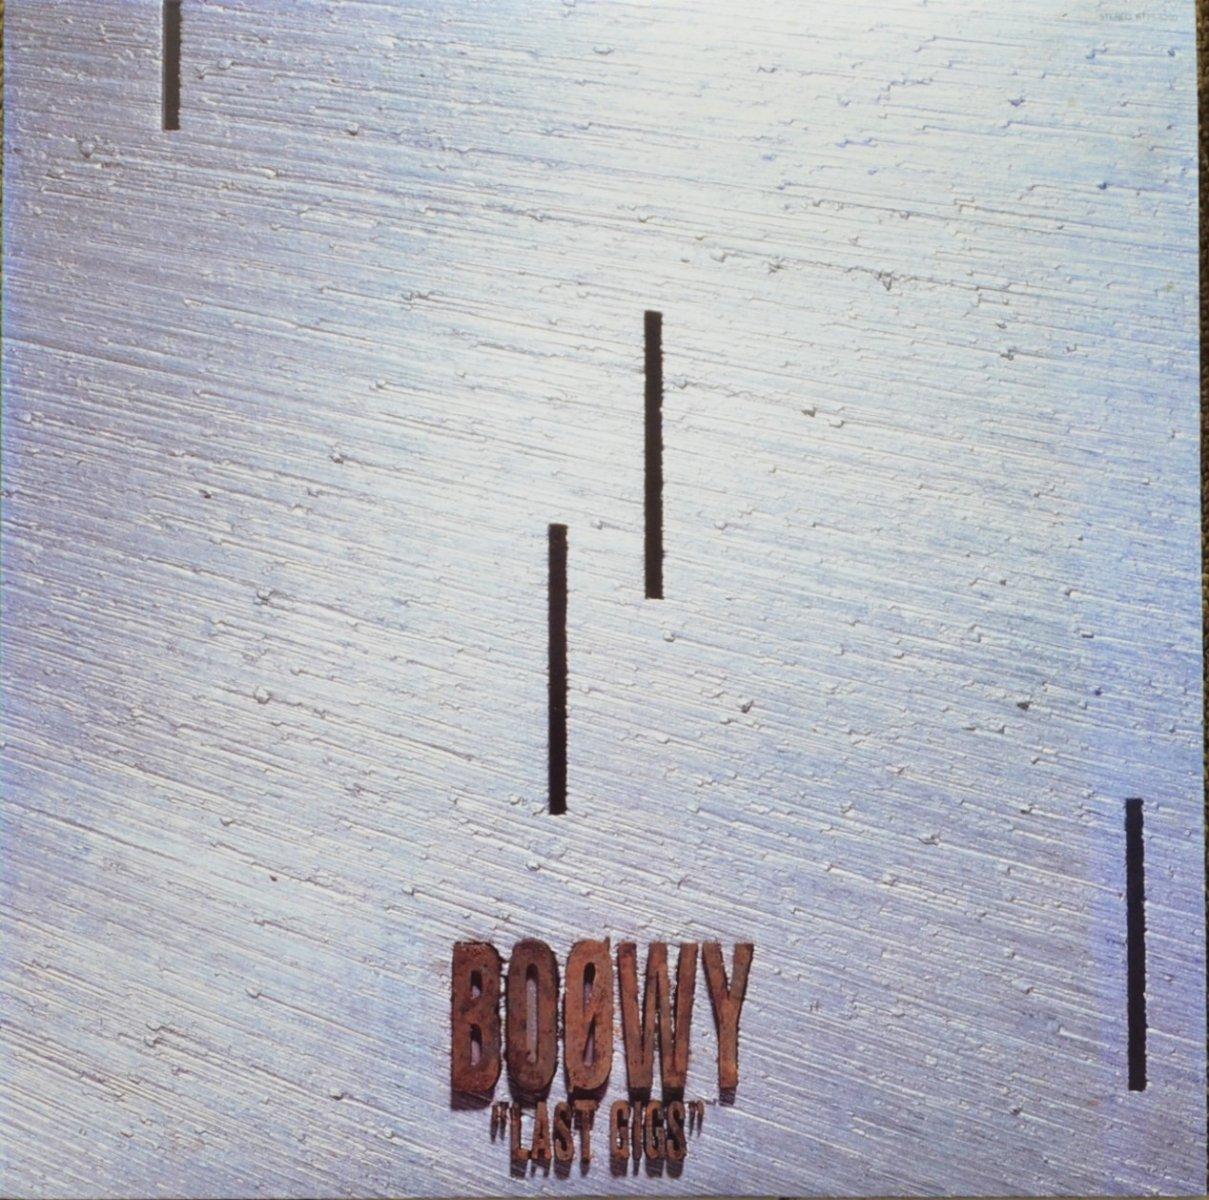 BOØWY / LAST GIGS (1LP)